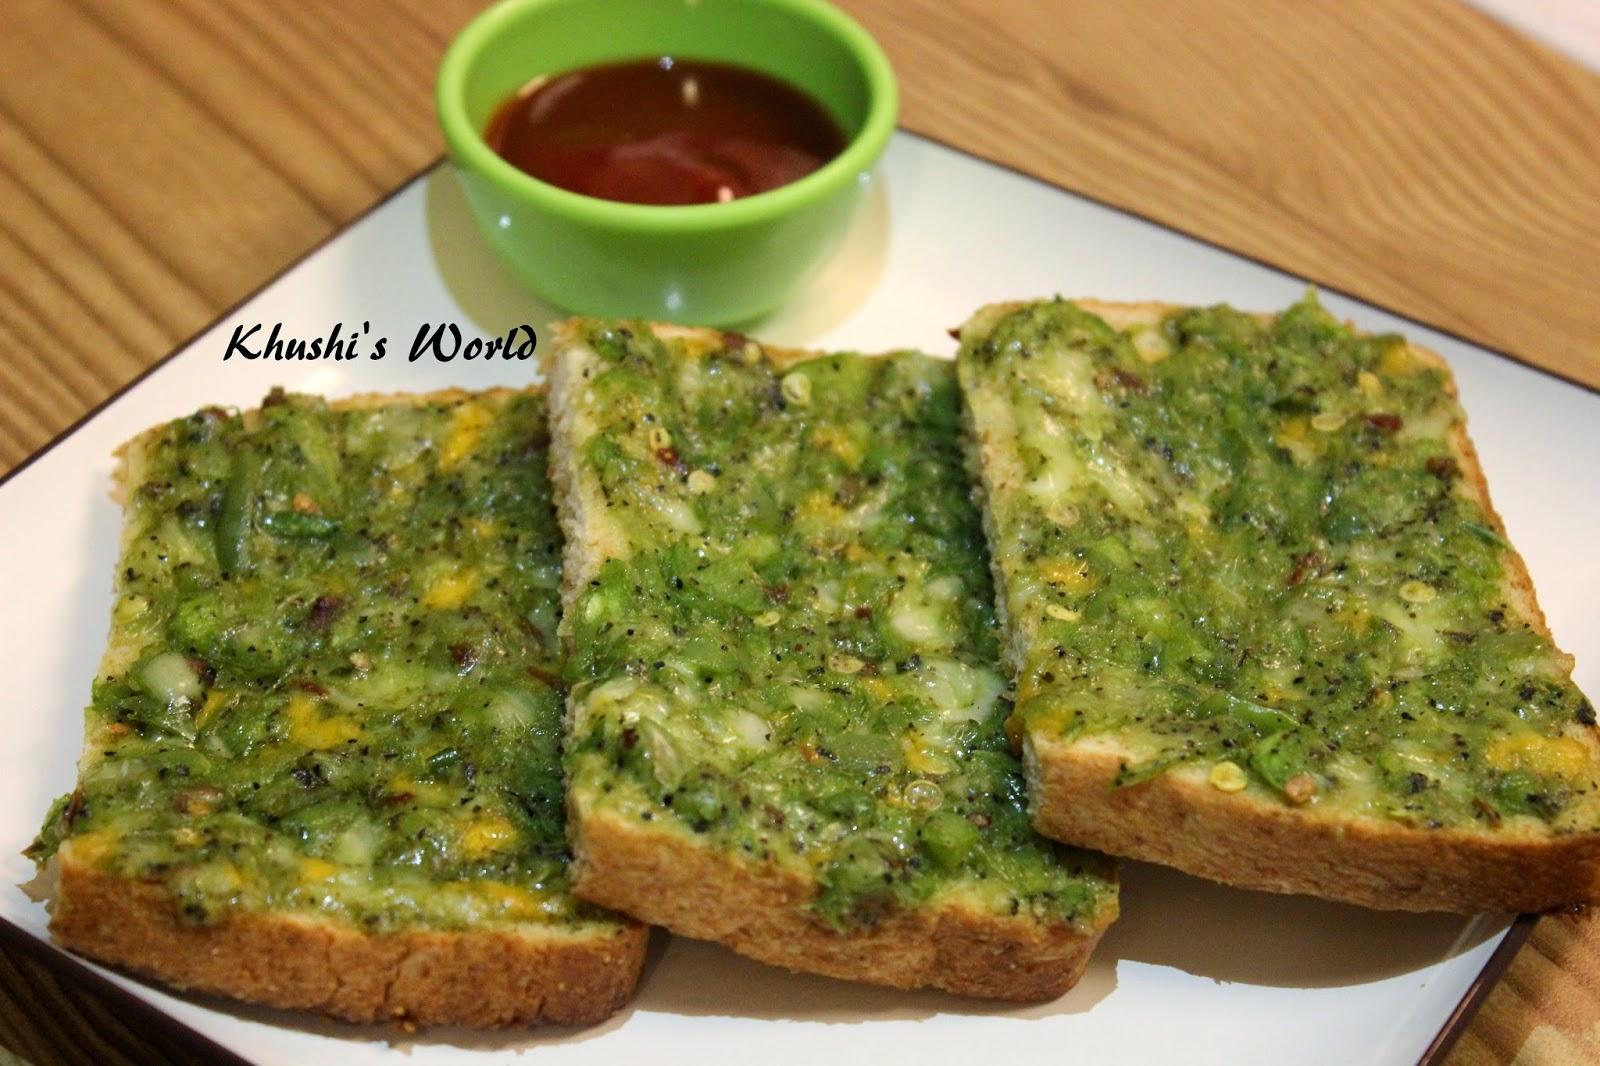 Khushi's World Cheese Chilli Toast